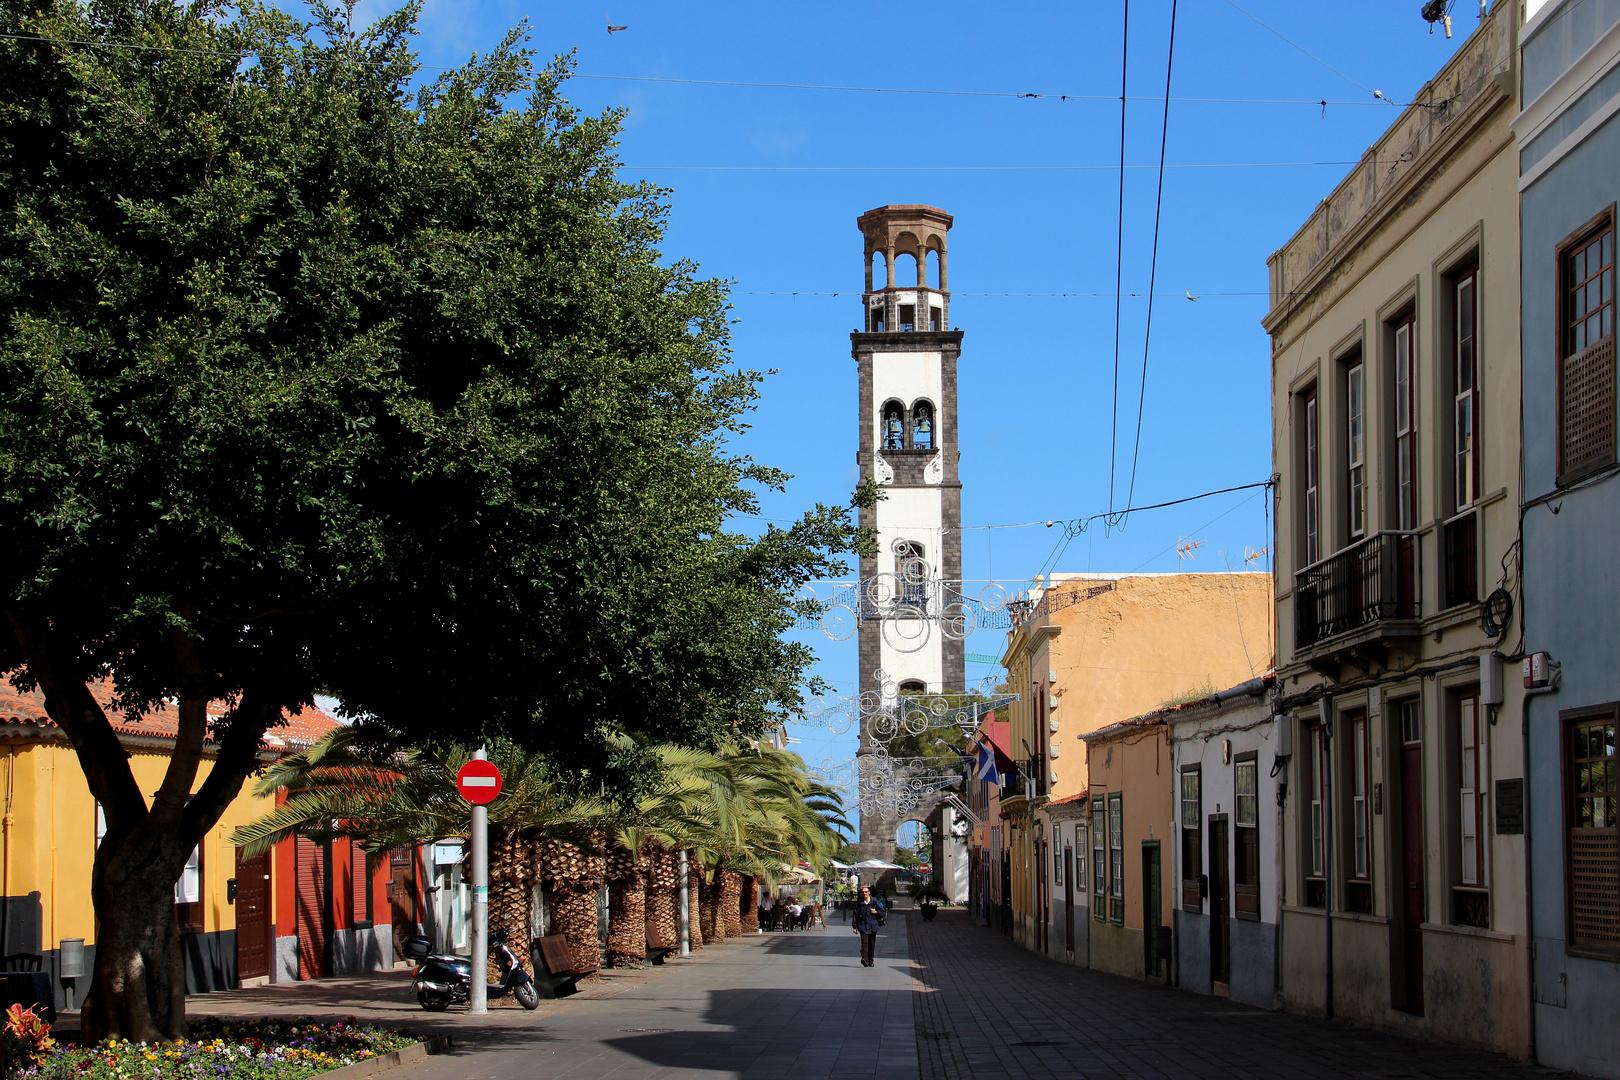 Santa Cruz - Iglesia Nuestra Senora de la Concepcio